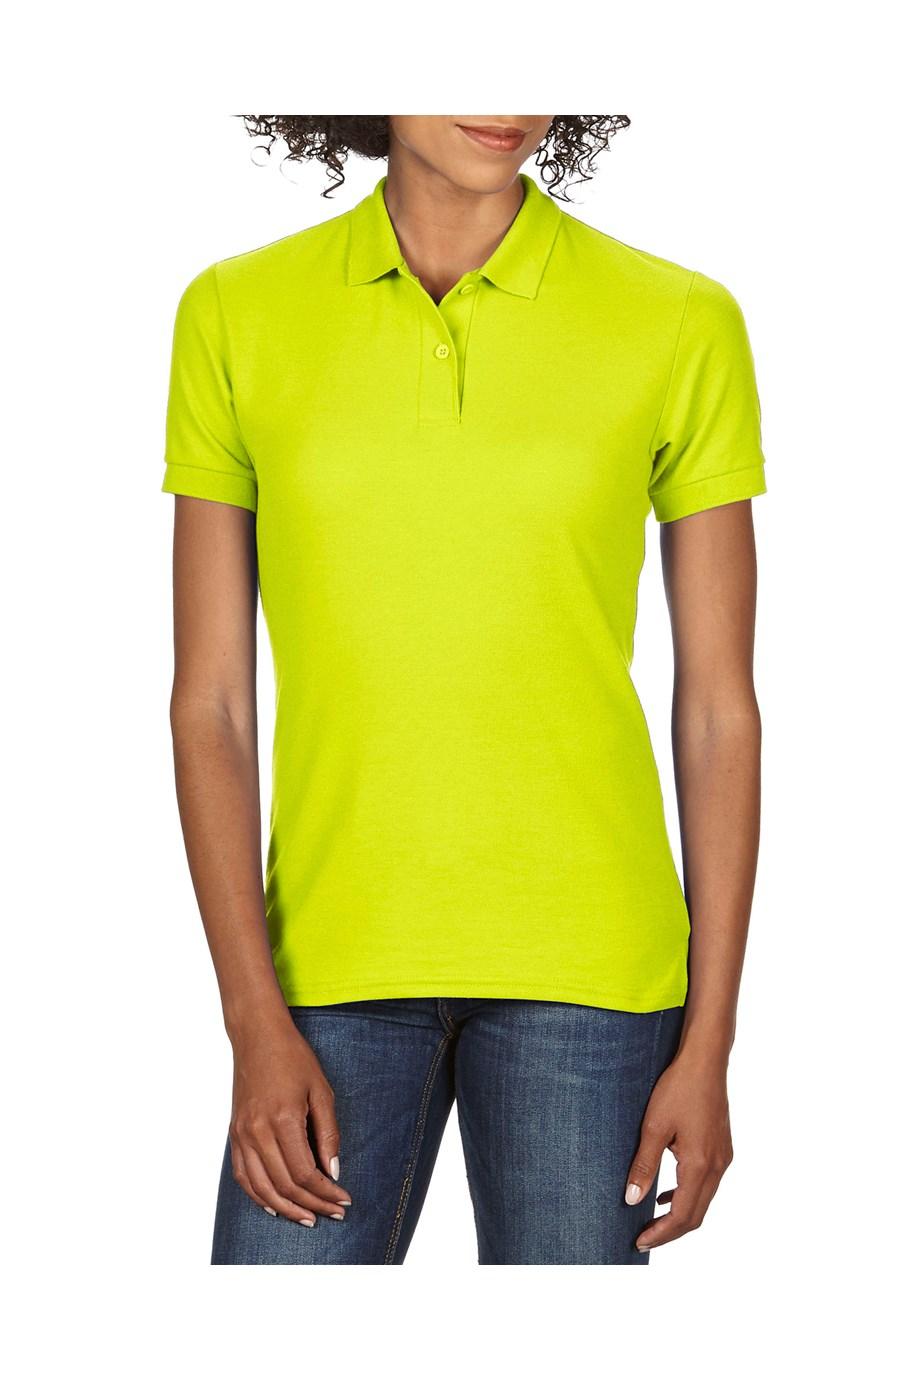 fluor yellow